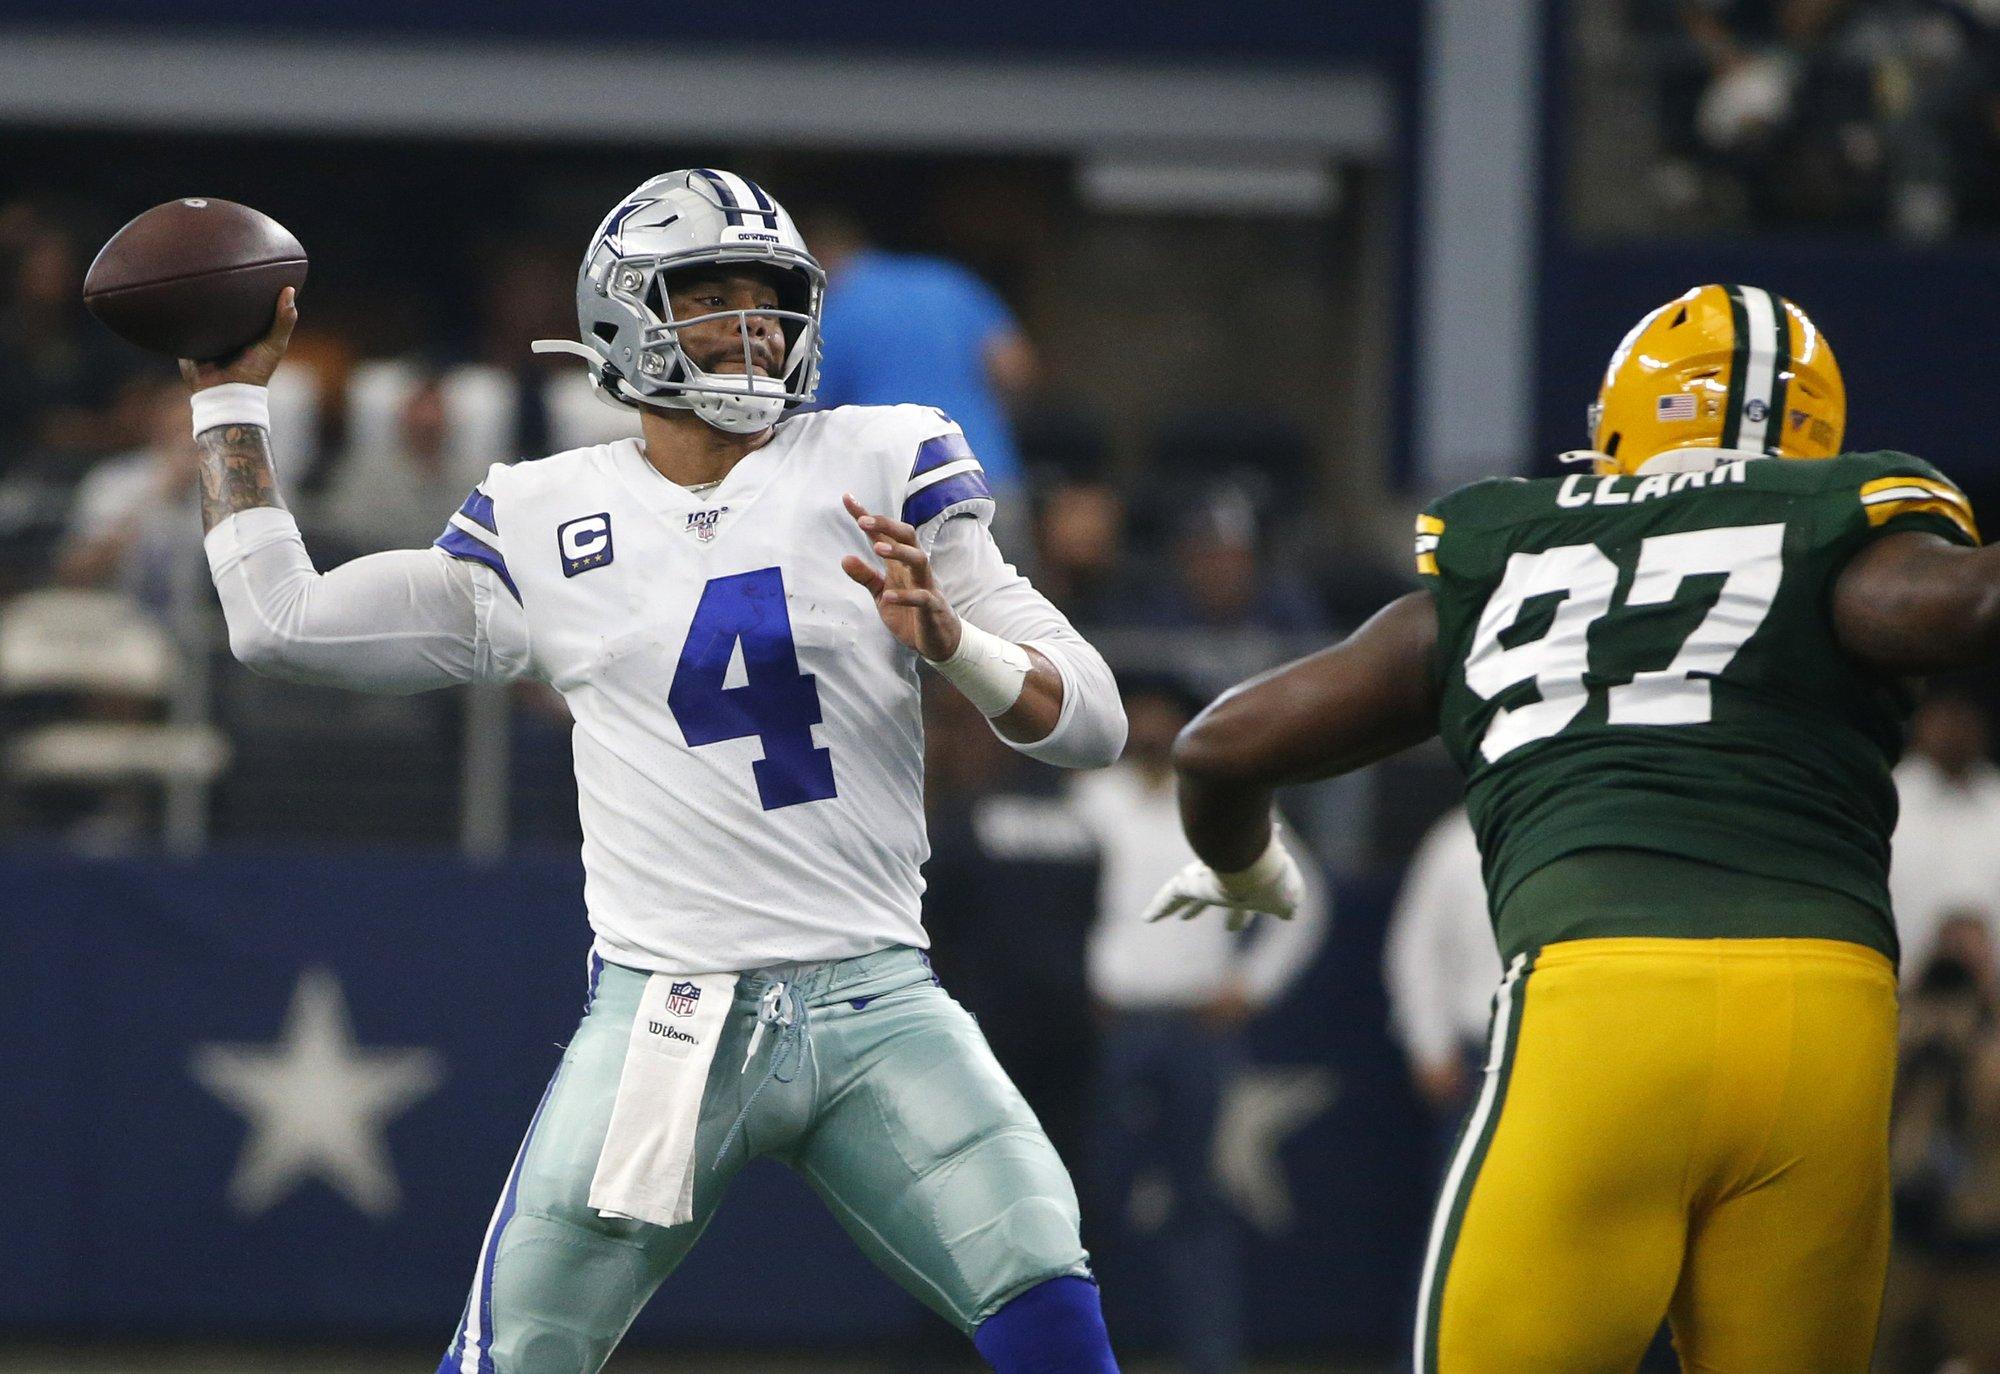 Cowboys' Prescott stays upbeat amid uptick in interceptions